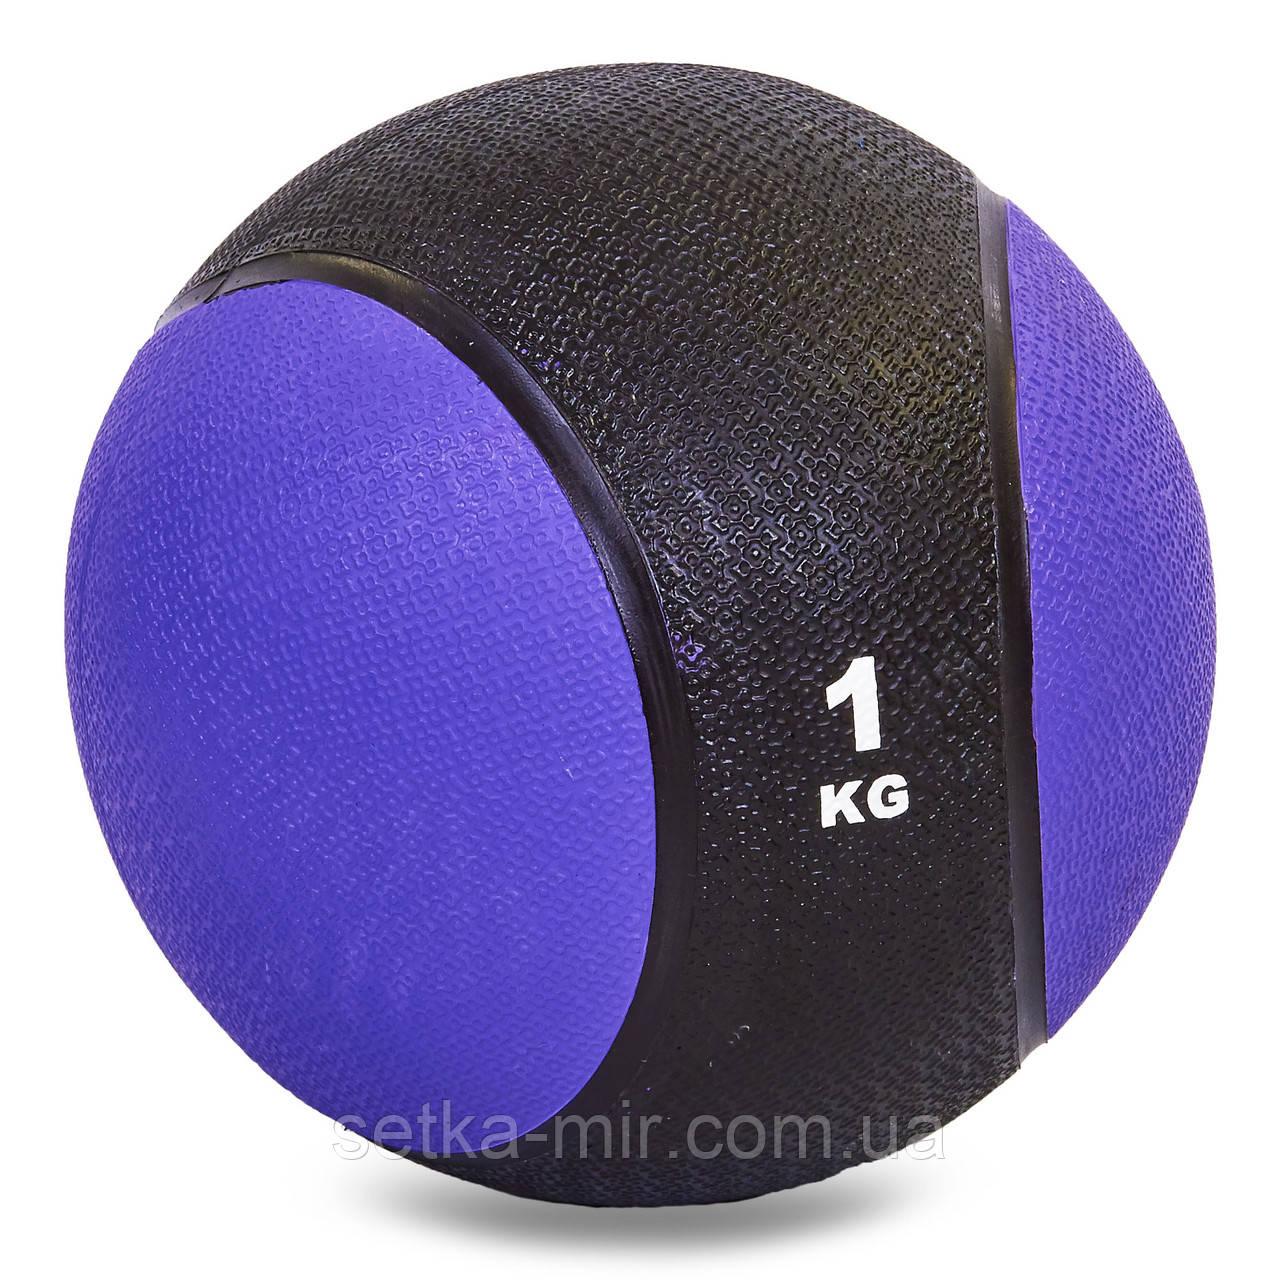 М'яч медичний медбол Record Medicine Ball C-2660-1 1кг